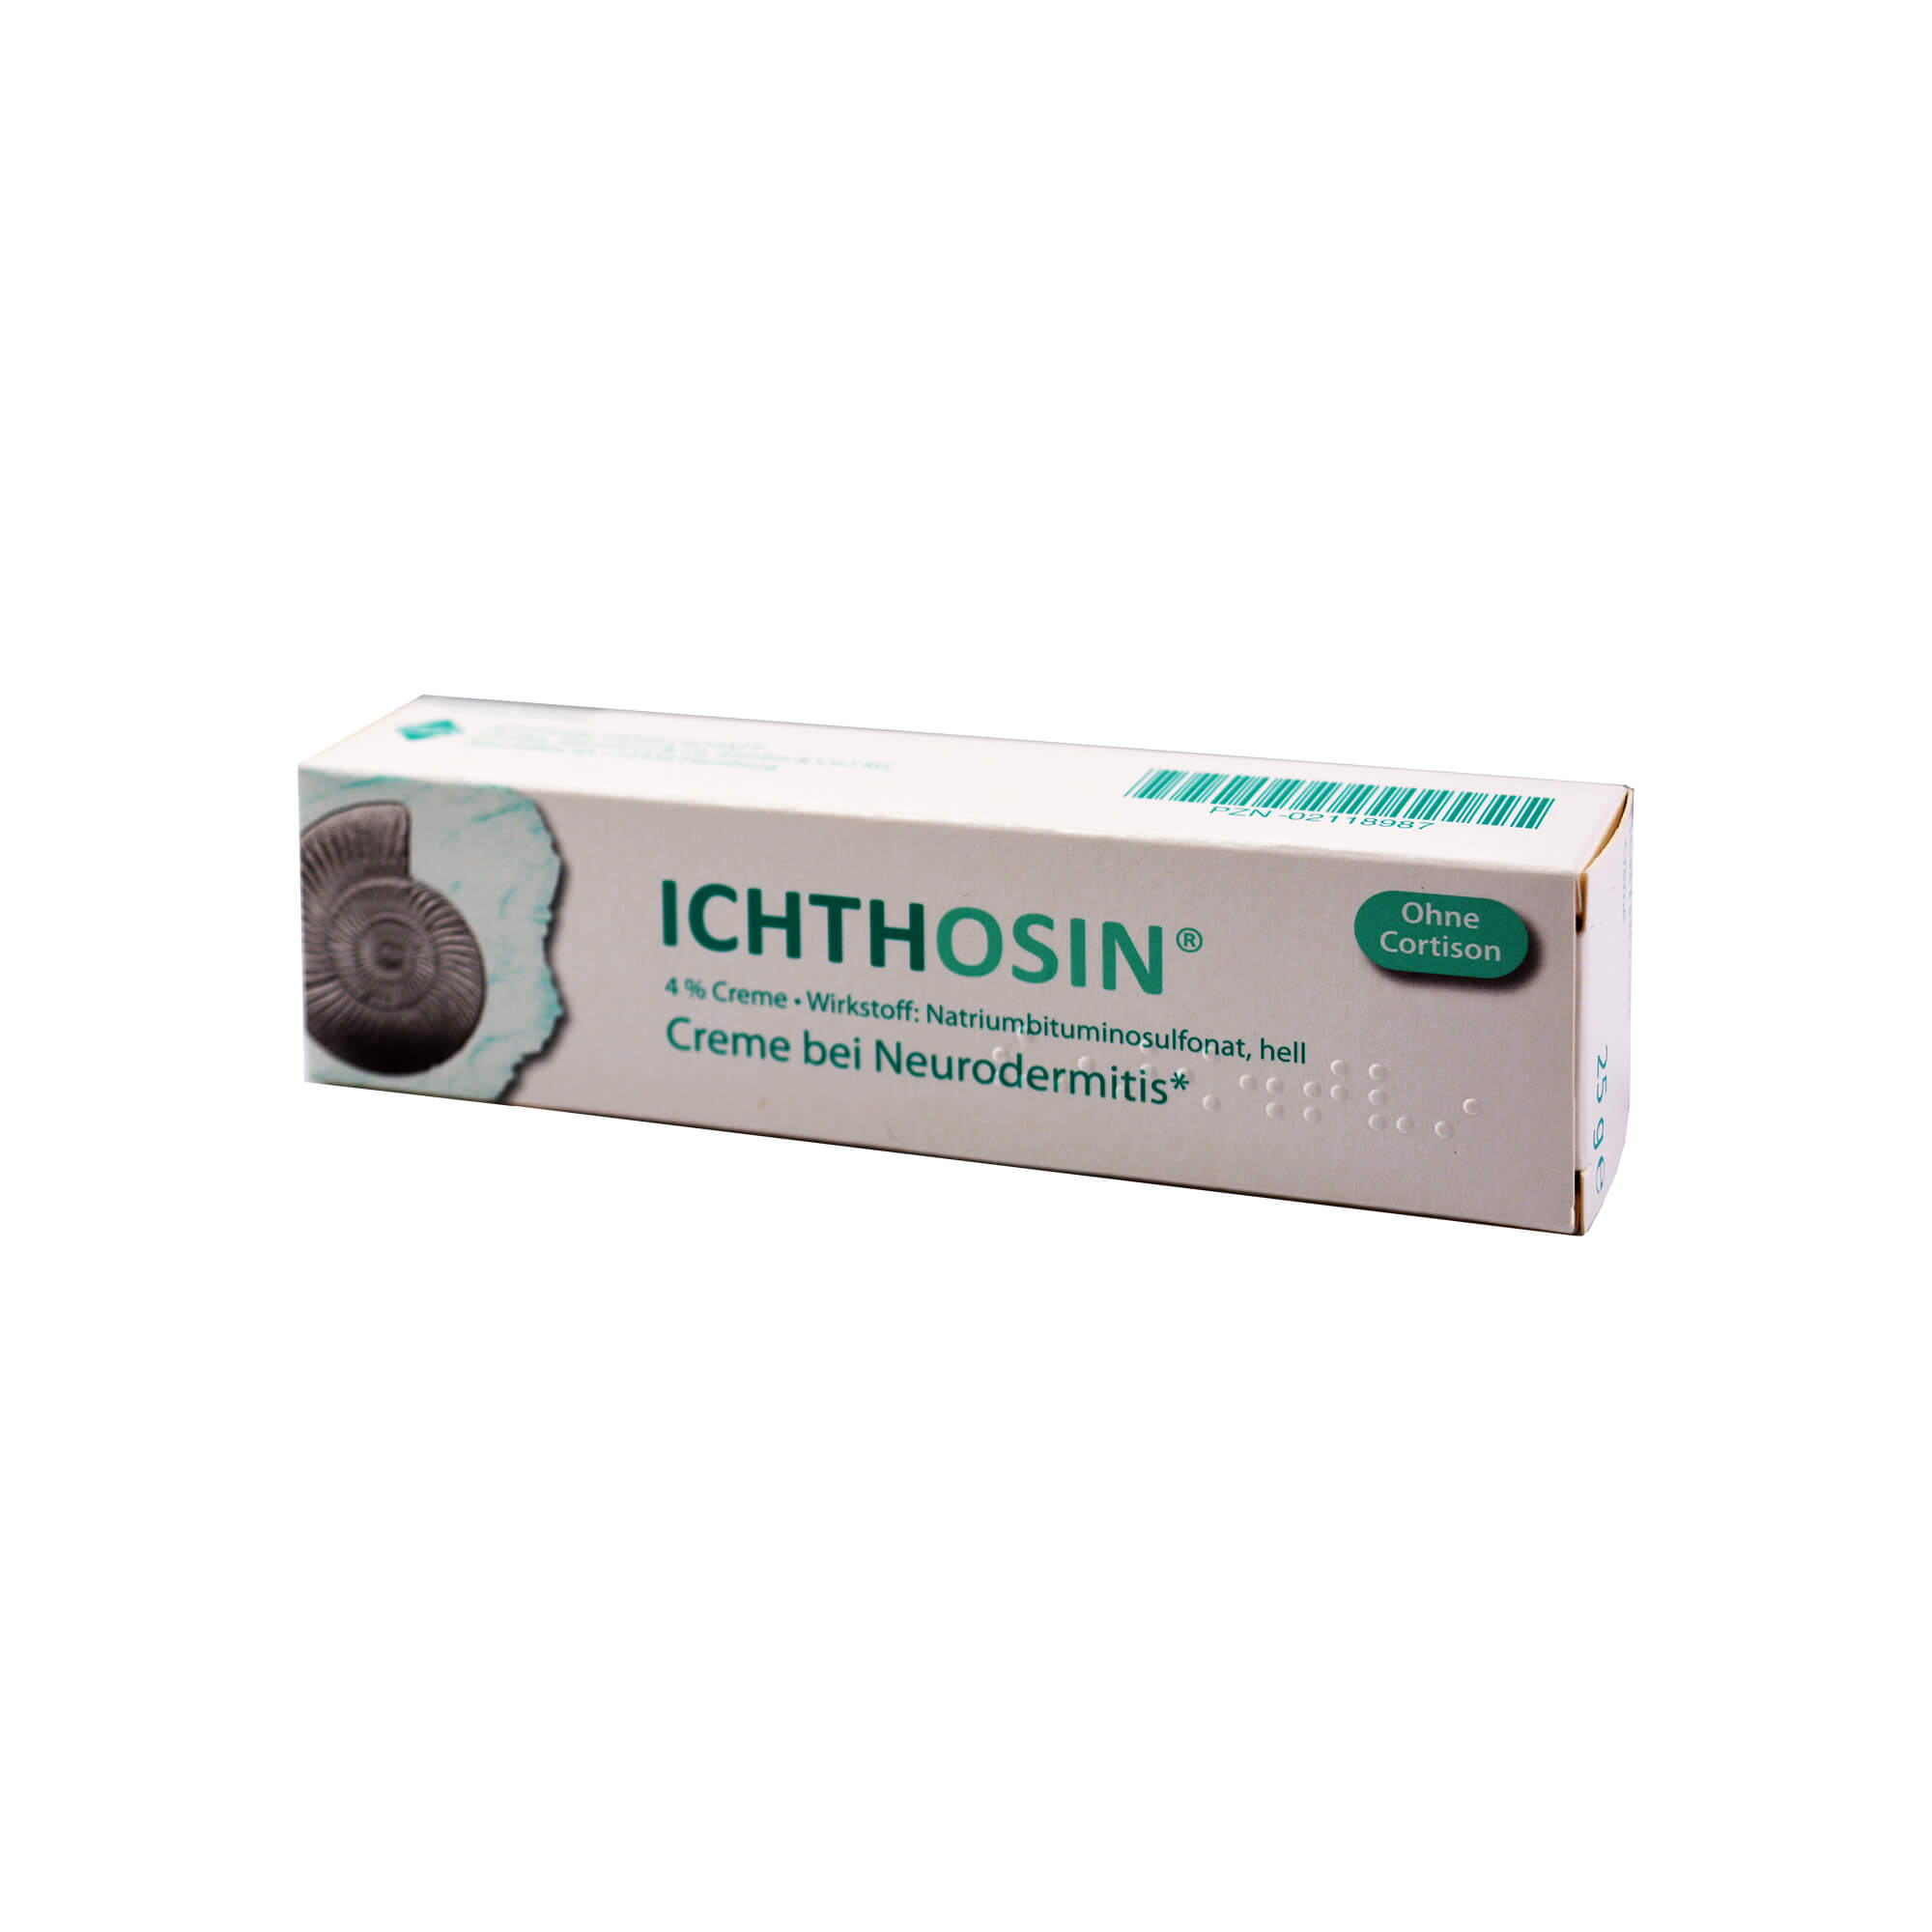 Ichthosin Creme